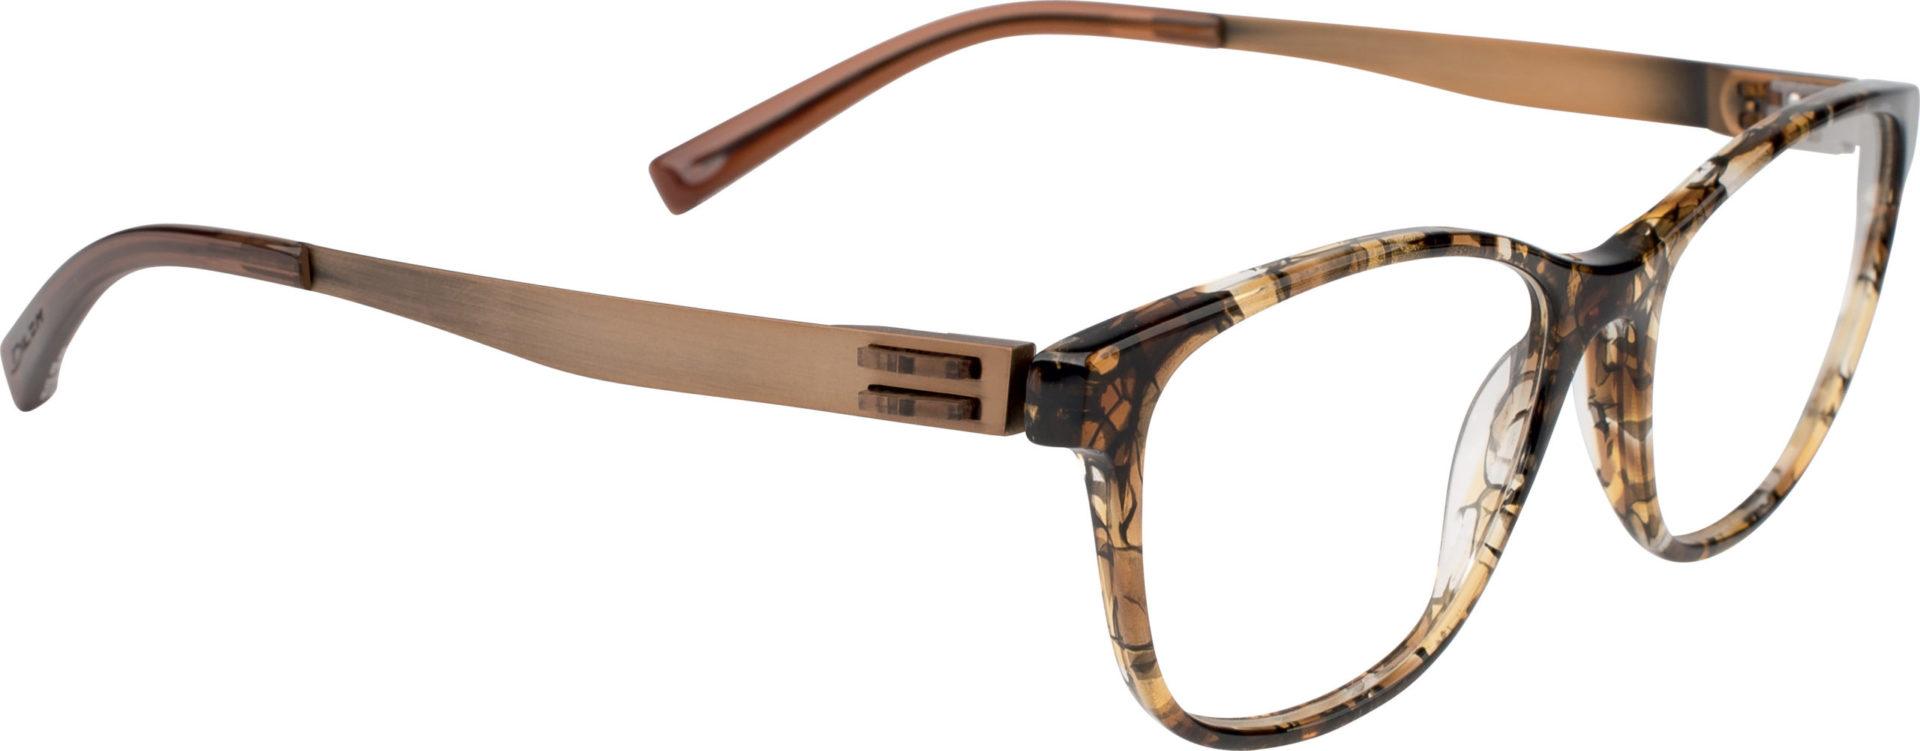 Dilem Brillen München